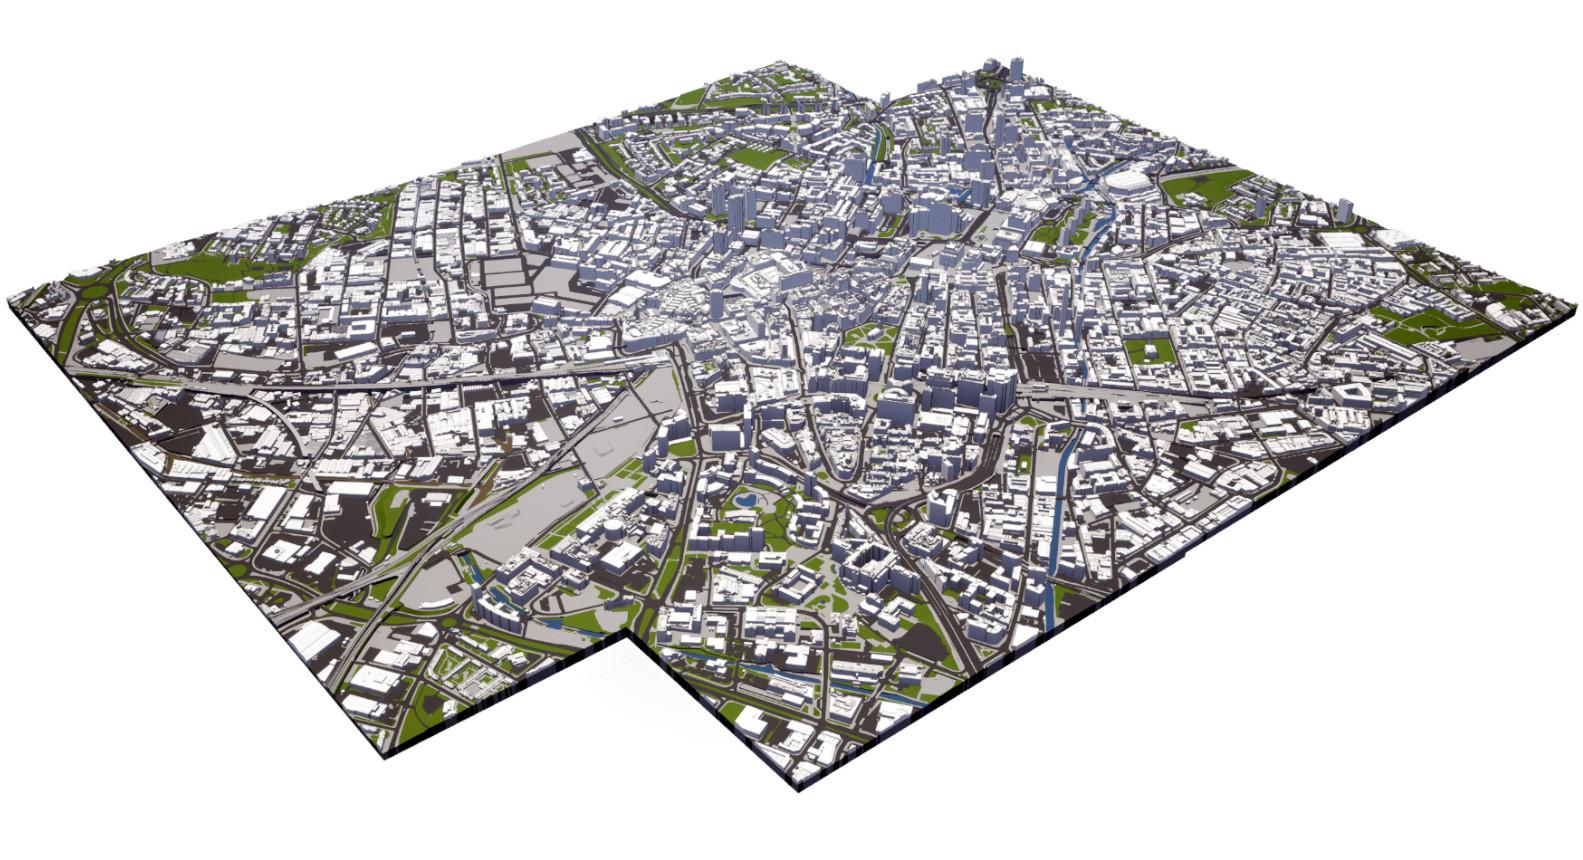 3D city model of Birmingham